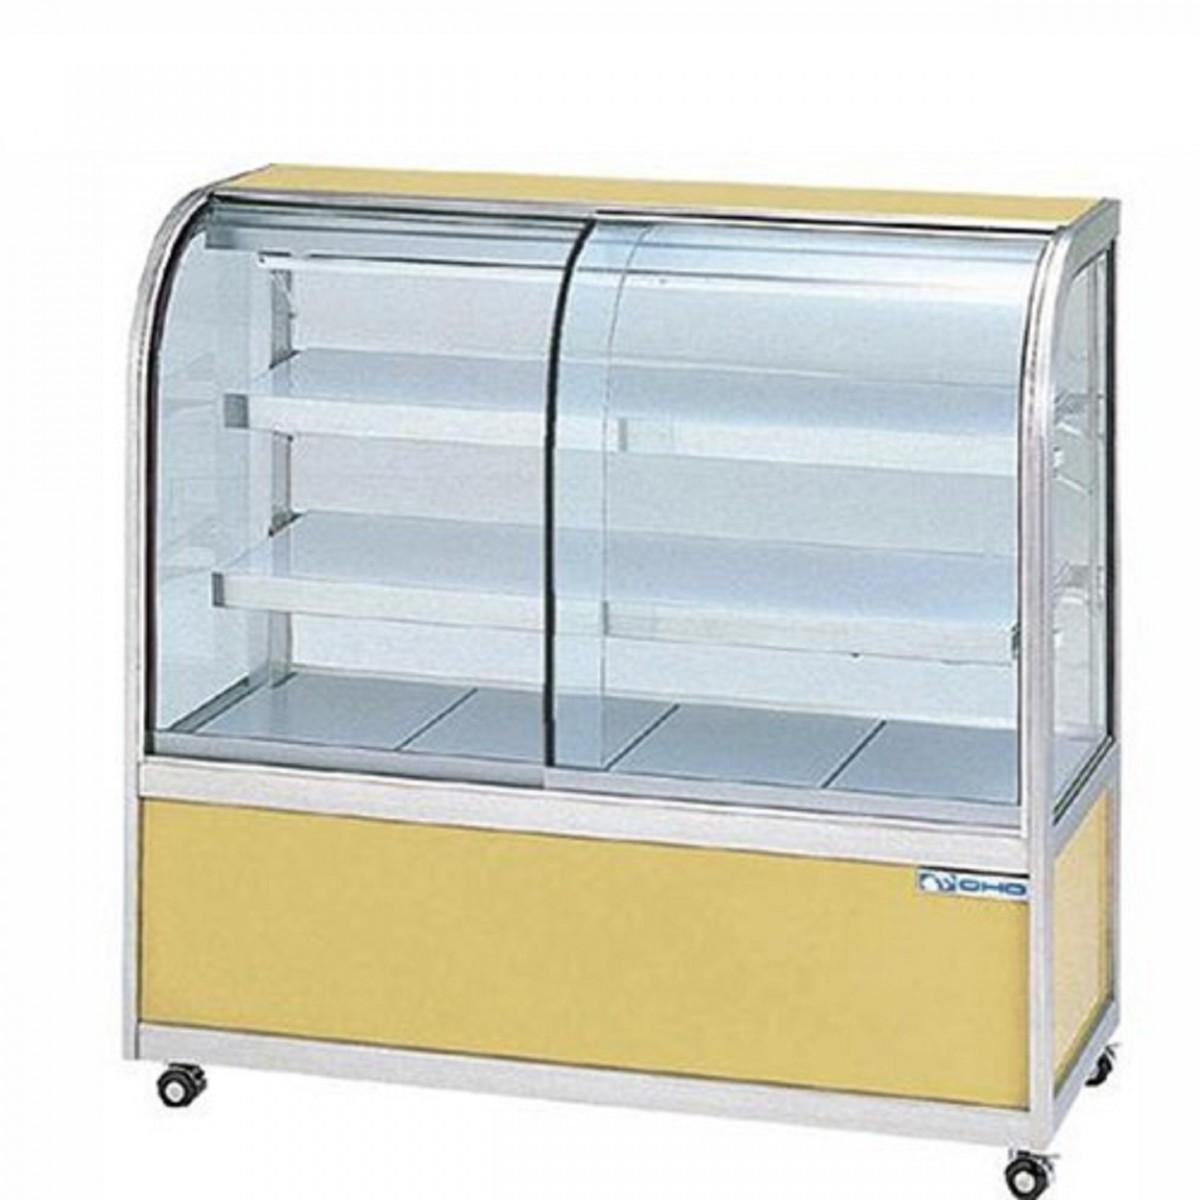 OHO 大穂製作所 冷蔵ショーケース OHGU-TF-2100W 両面引戸